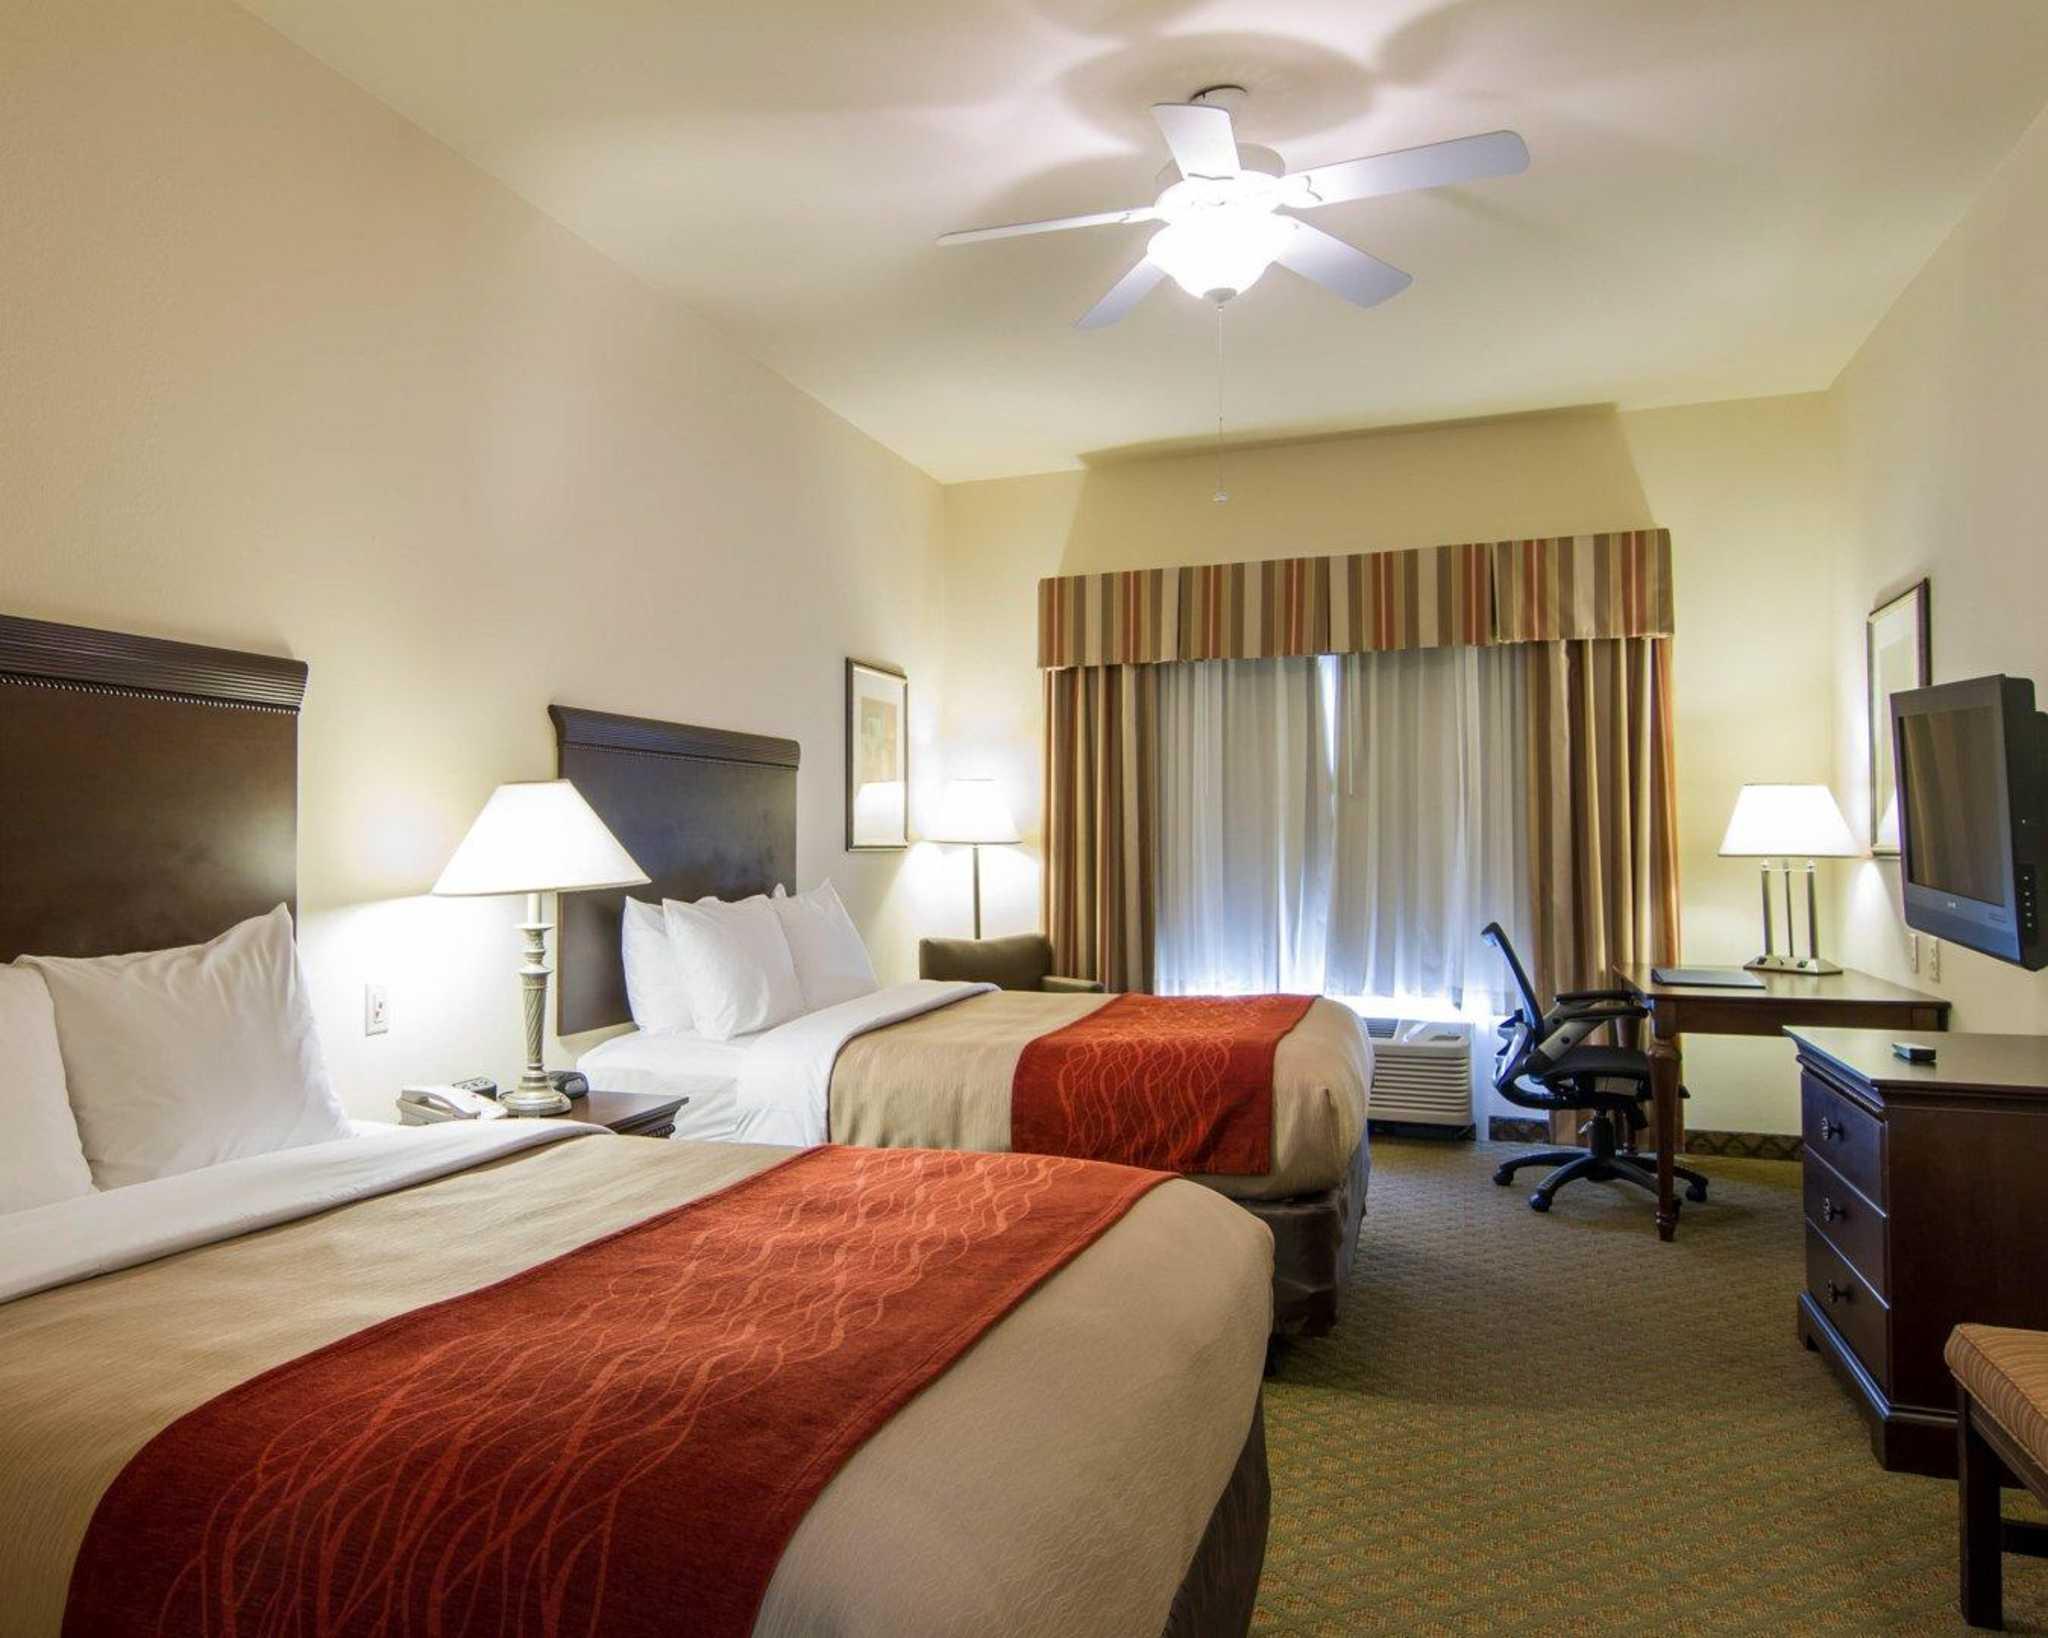 Comfort Inn & Suites Airport image 32